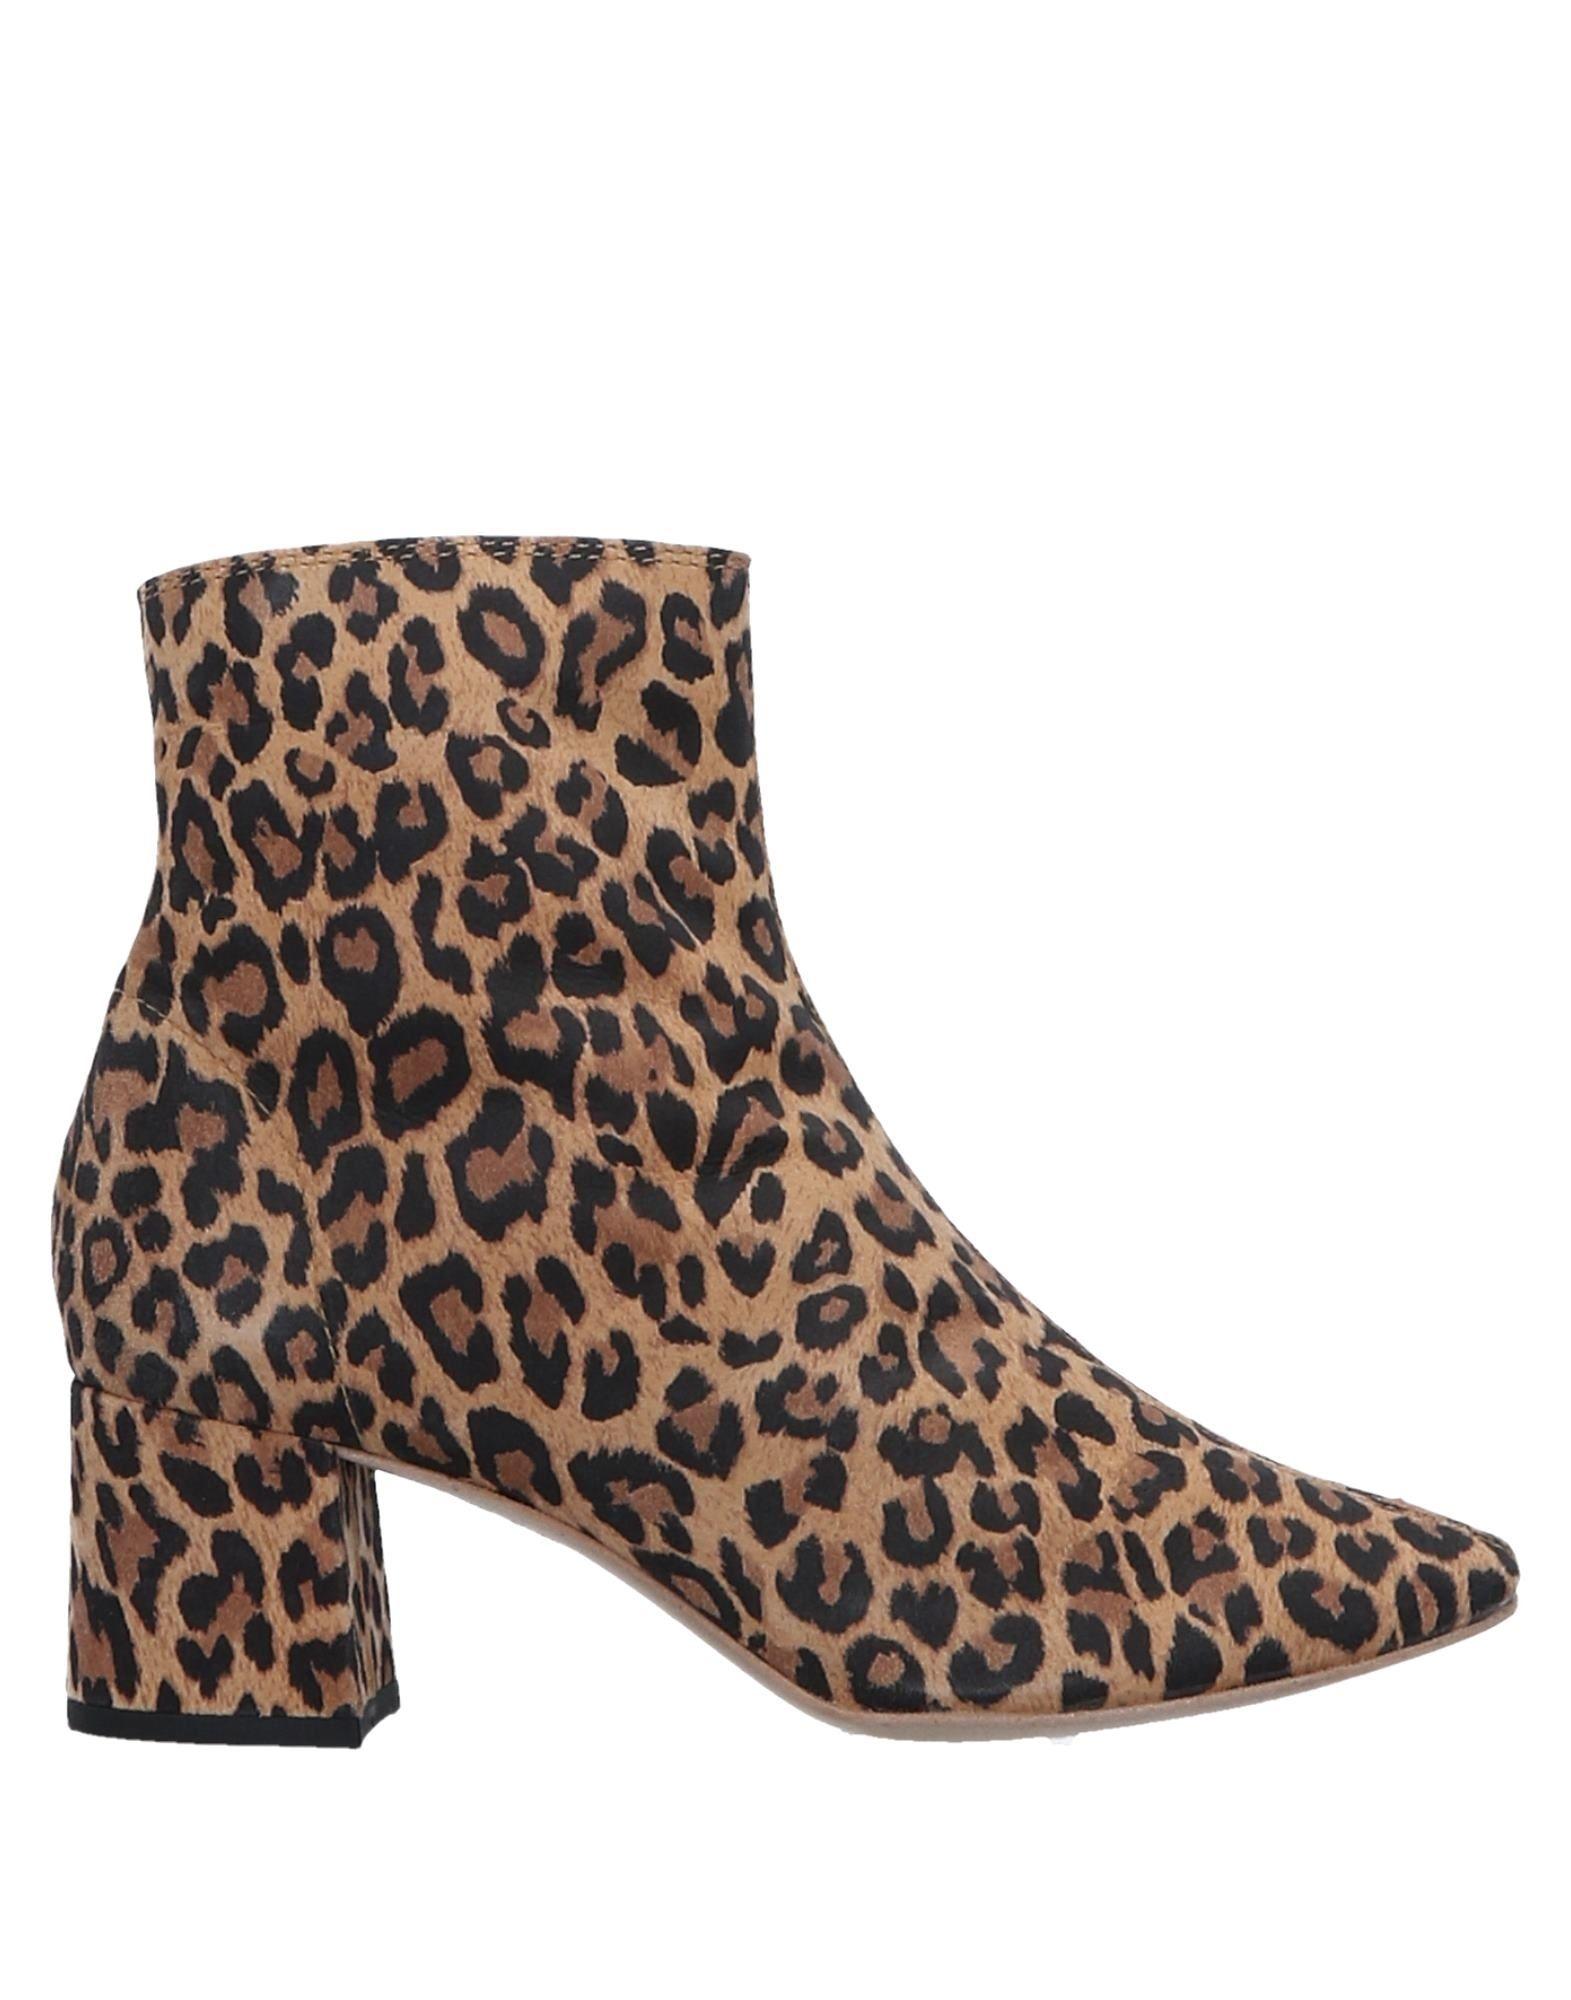 Lollipops Stiefelette Damen  11515752OU Schuhe Gute Qualität beliebte Schuhe 11515752OU 9c07ad